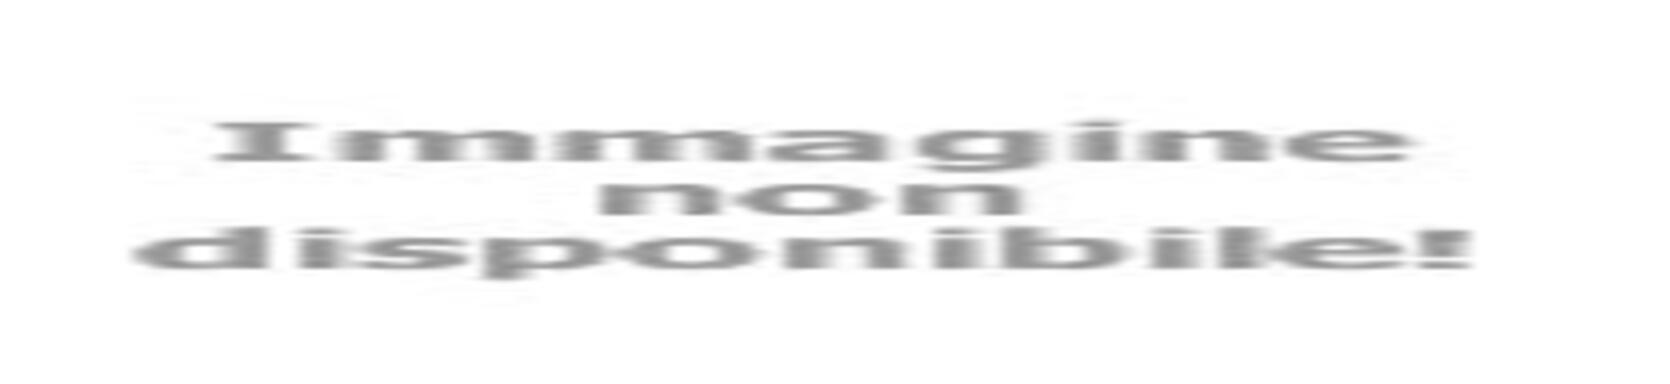 basketriminicrabs it 6-1083-video-ceccarules-n.19 003